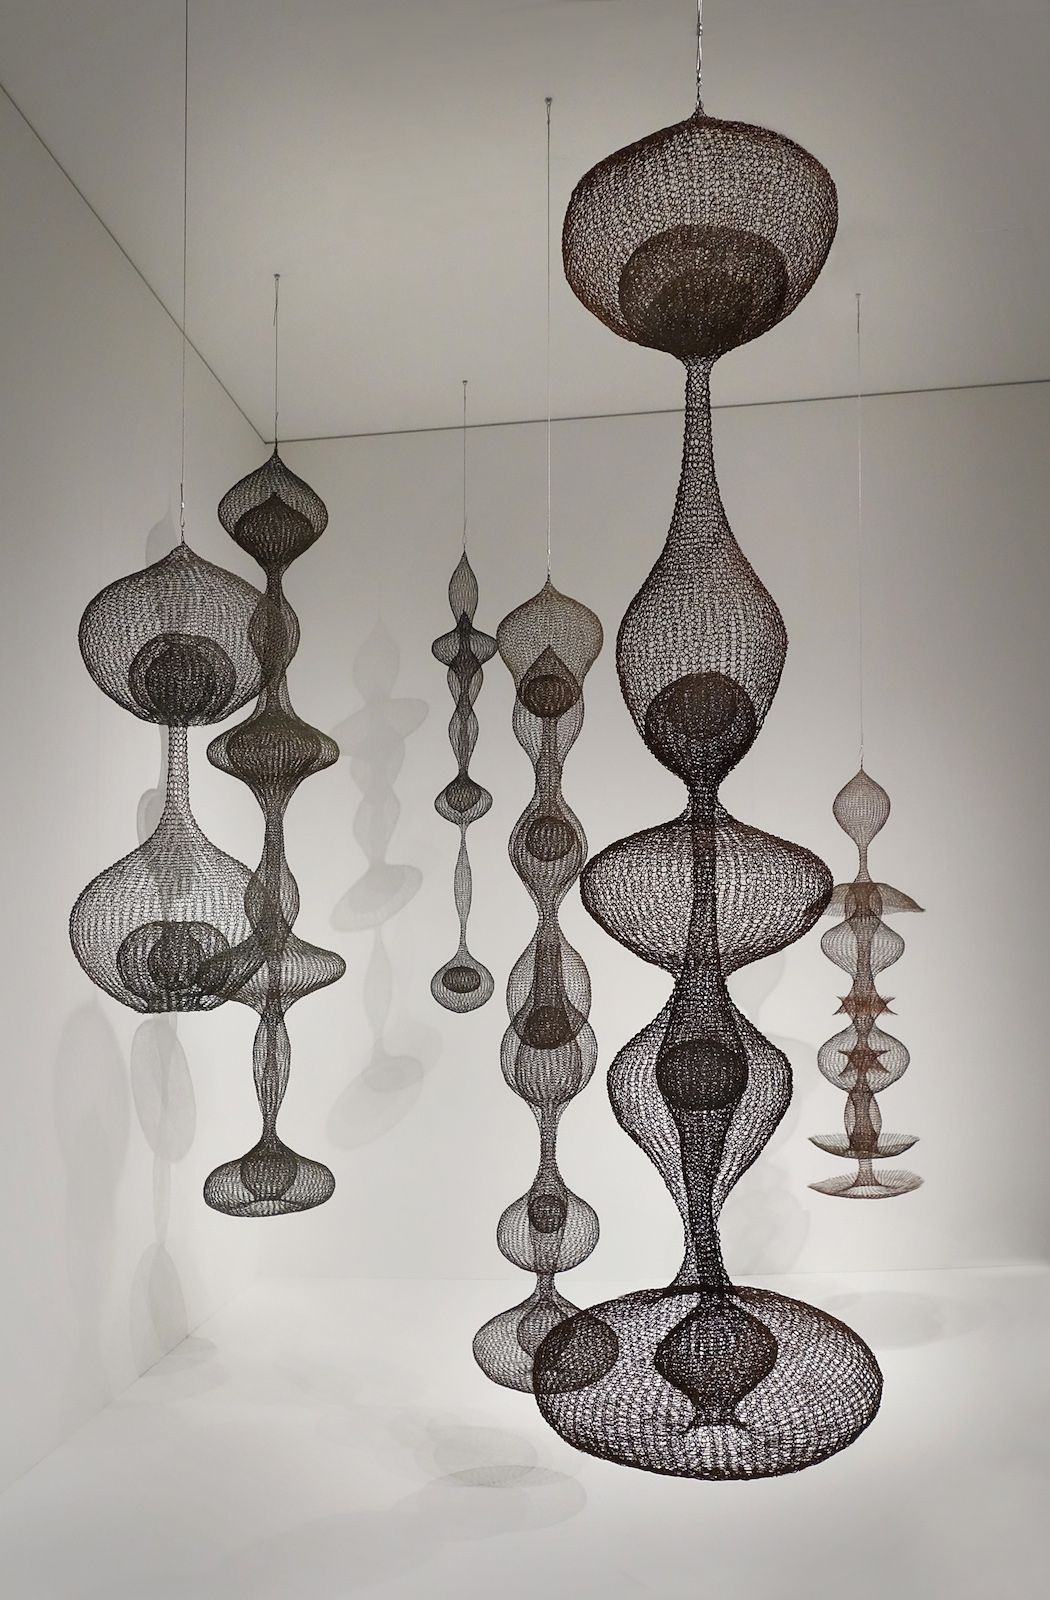 Sculpture Ruth Asawa Wire Sculpture Ruth Asawa Sculptures